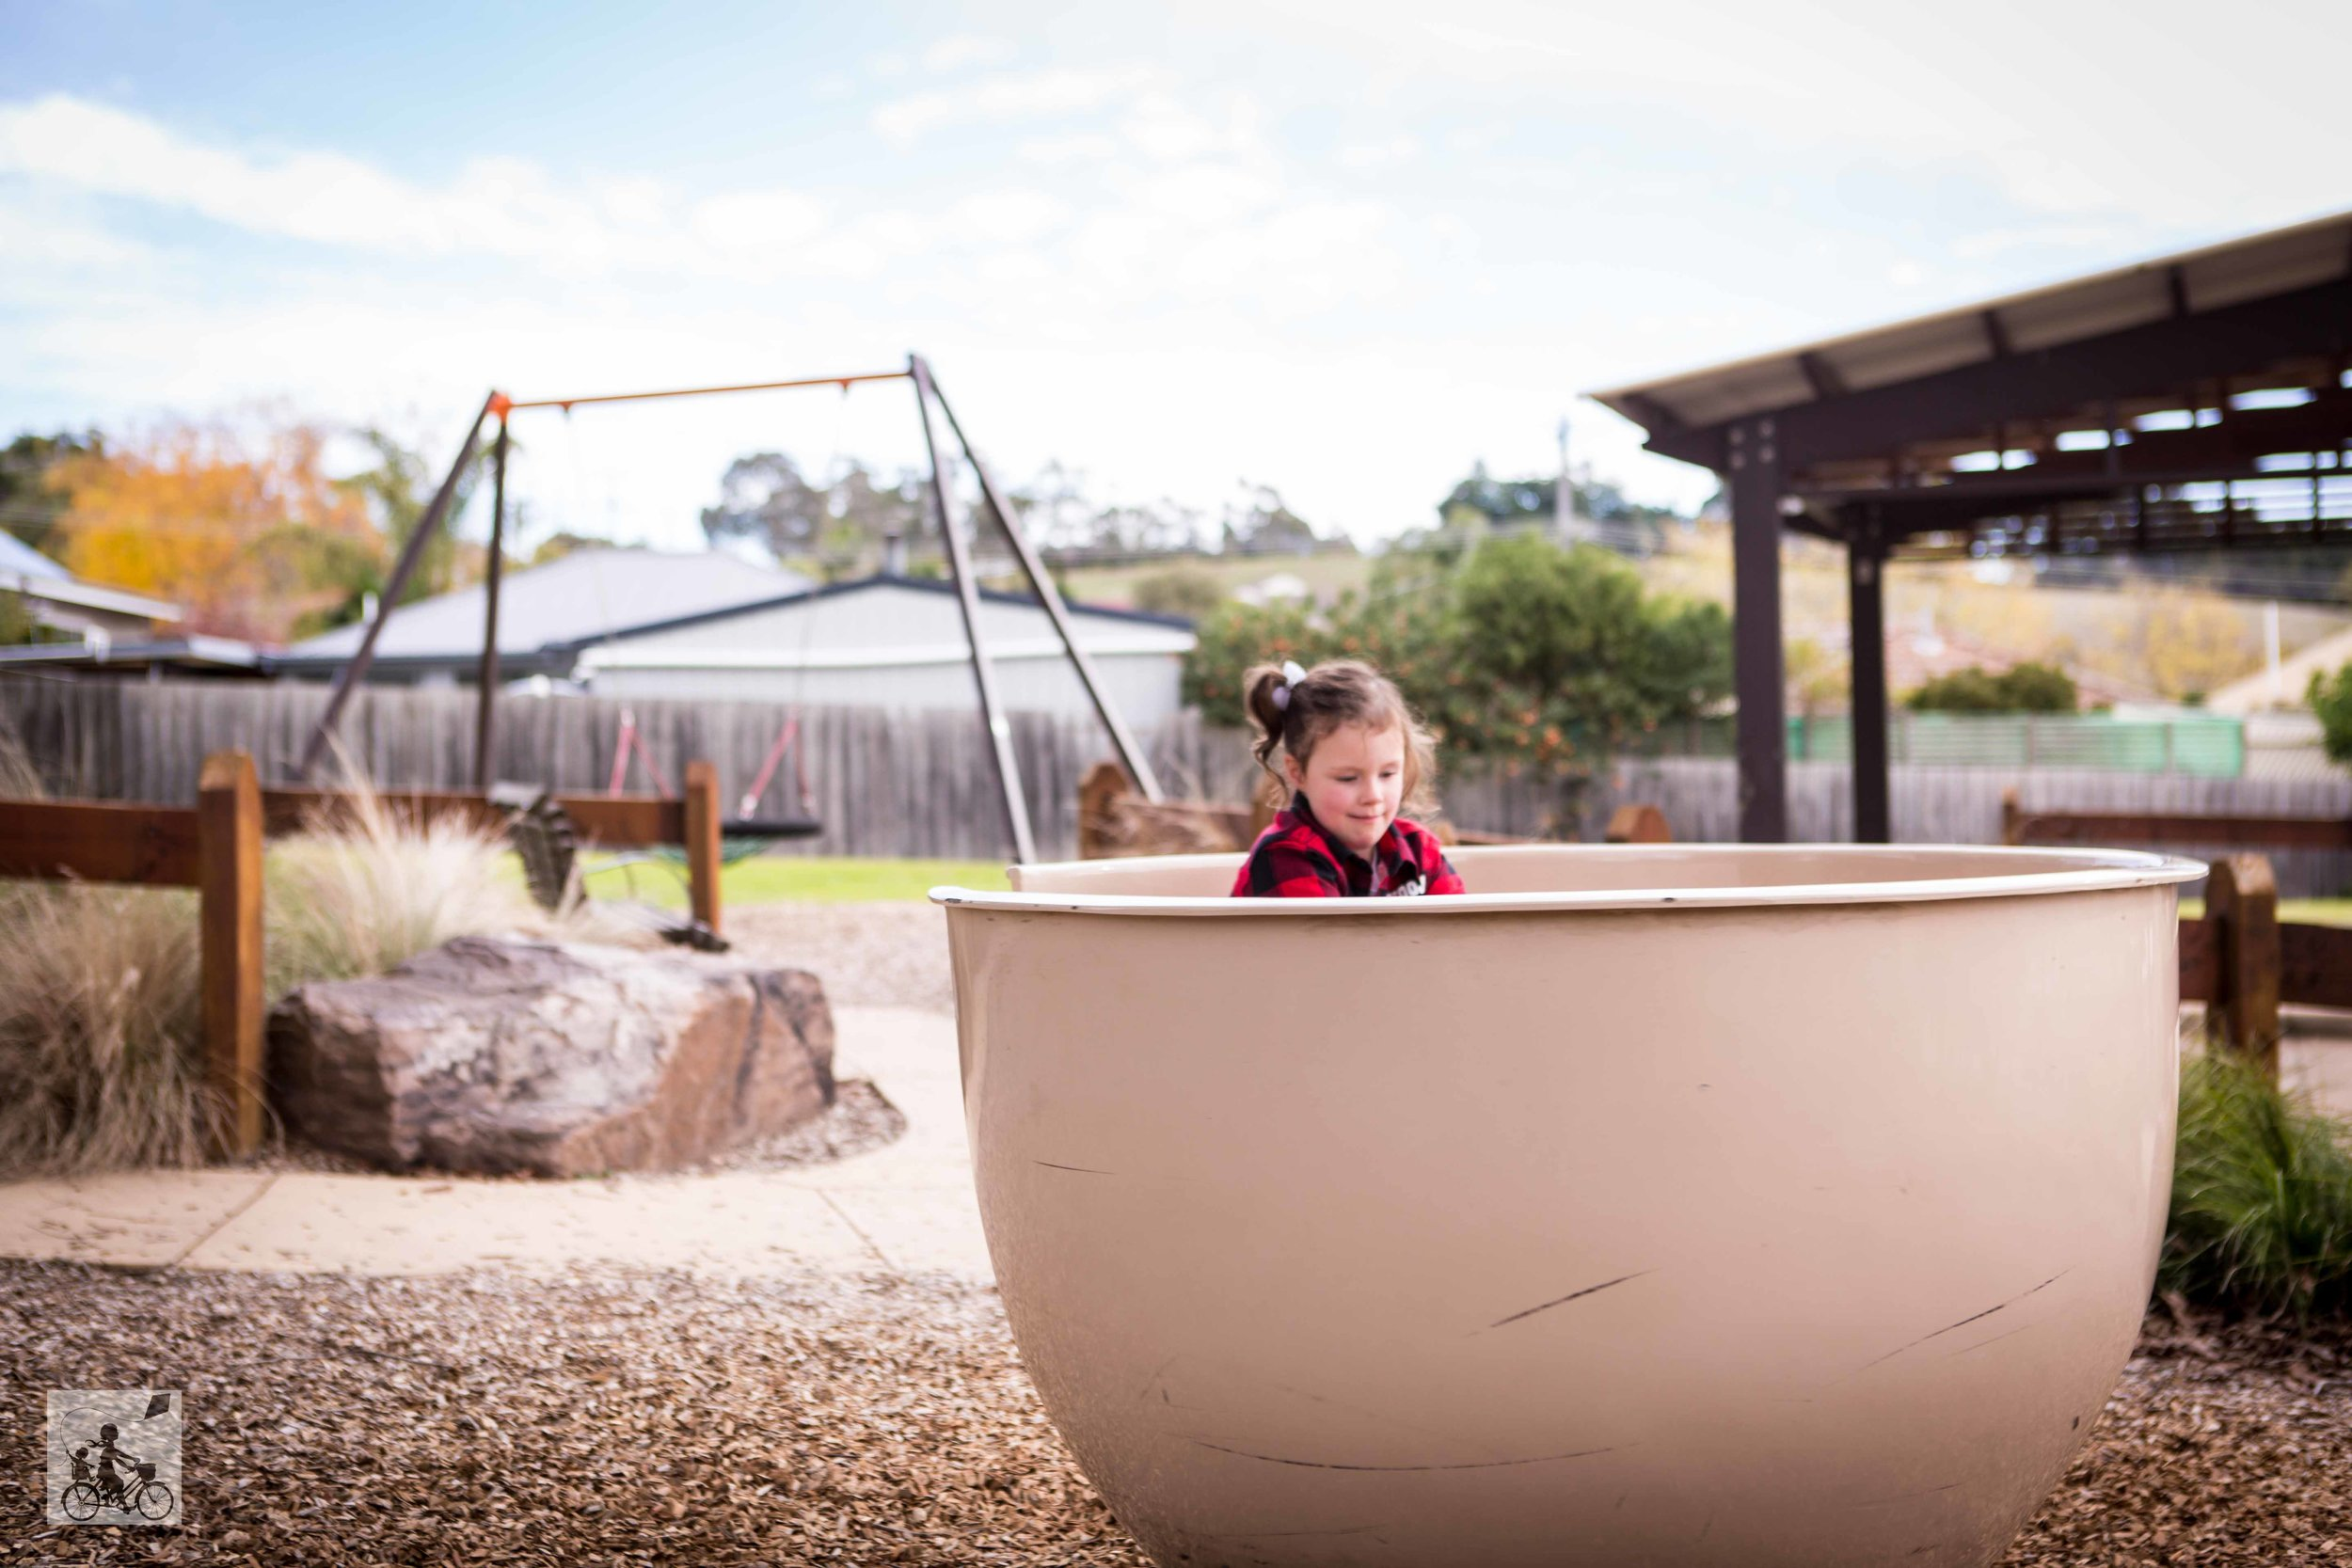 Woori Yallock Playground - Mamma Knows East (6 of 15).jpg